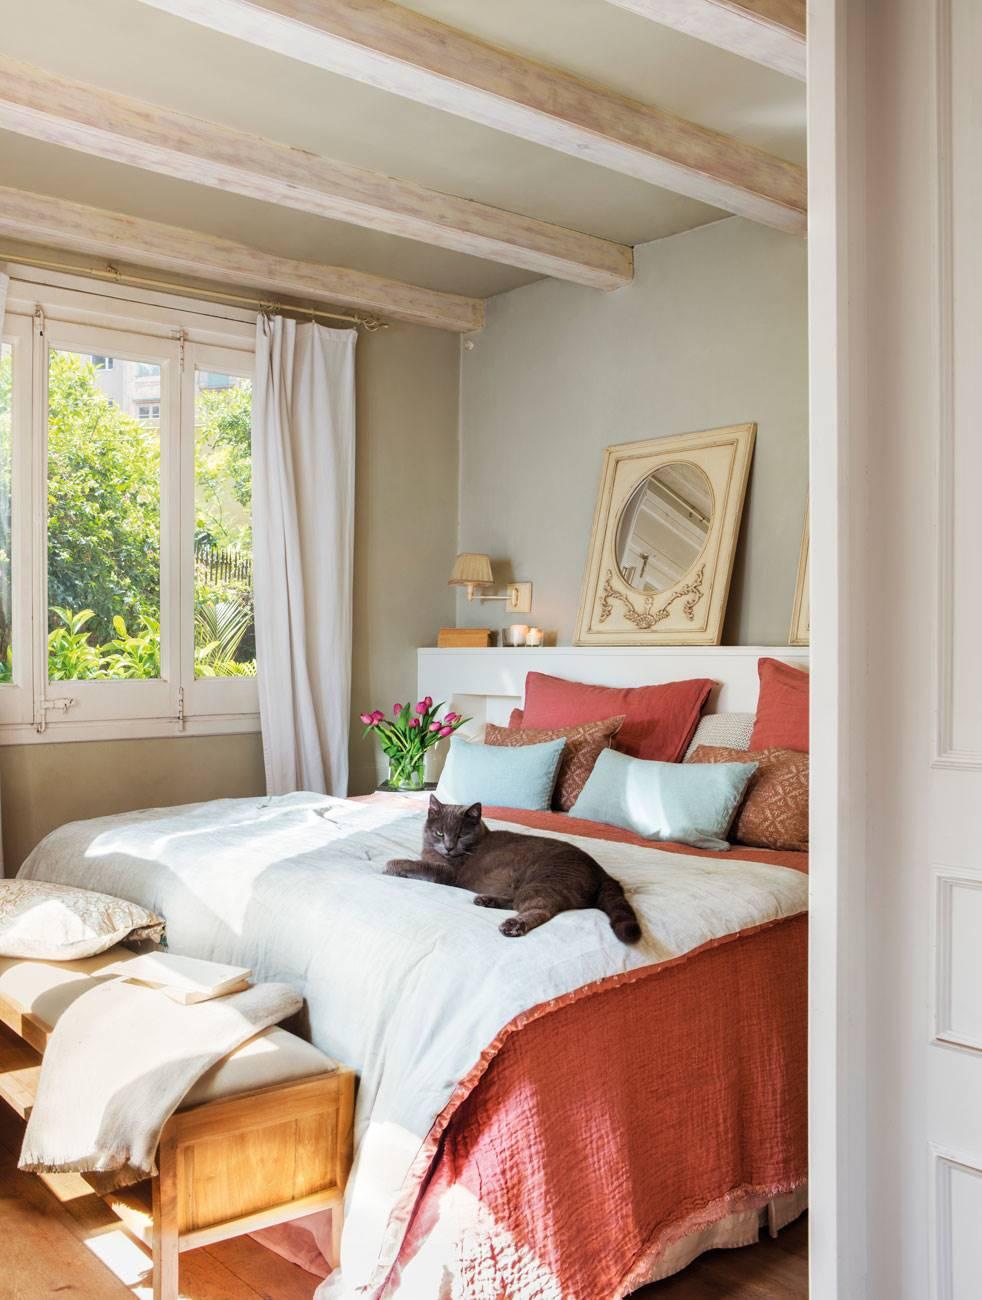 dormitorio-con-gato-sobre-casa. Romanticismo a medida